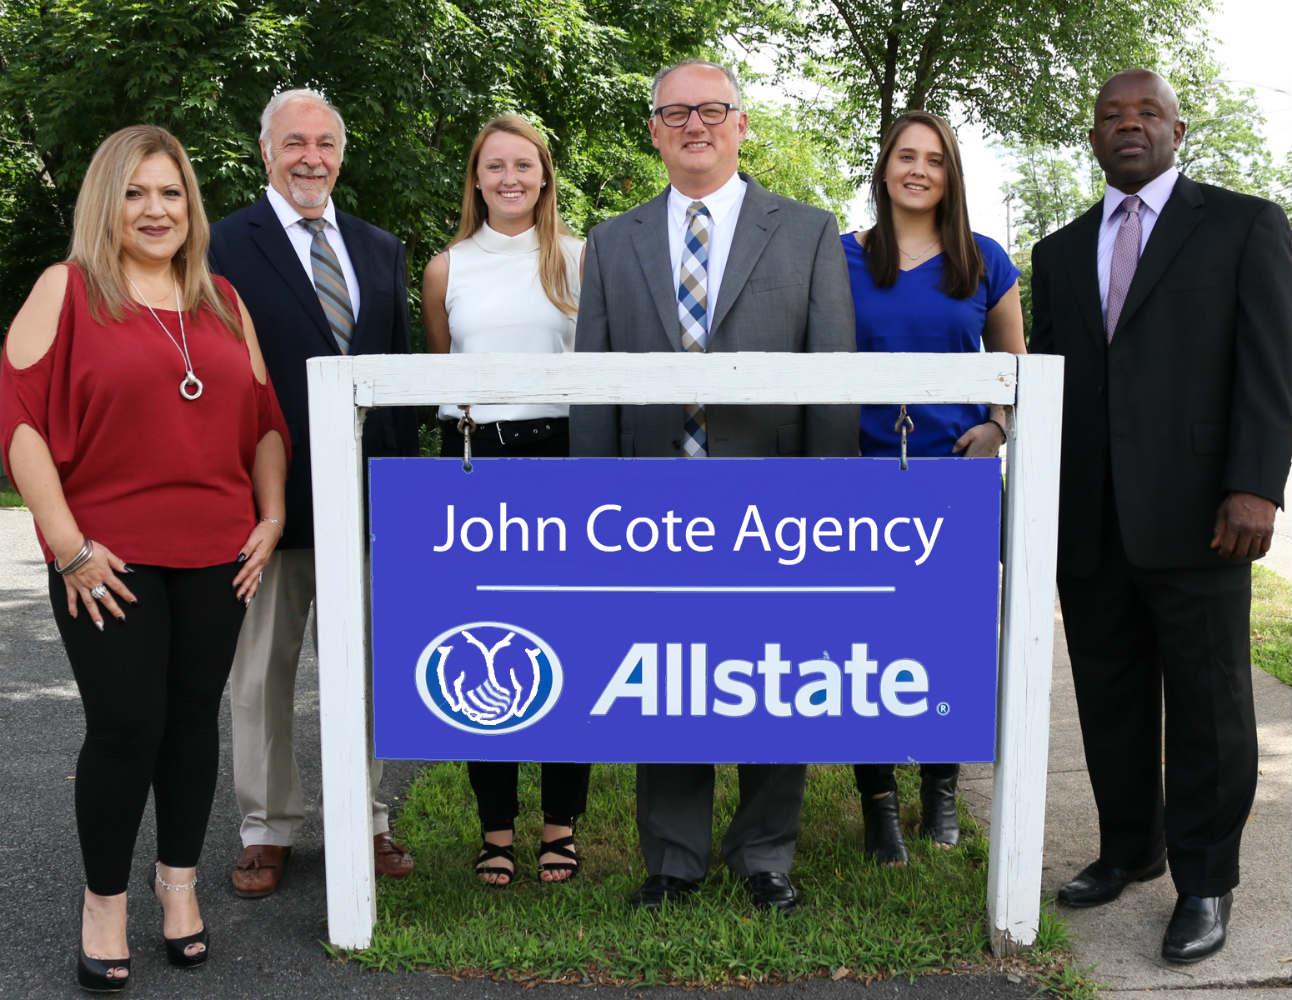 John Cote: Allstate Insurance image 1